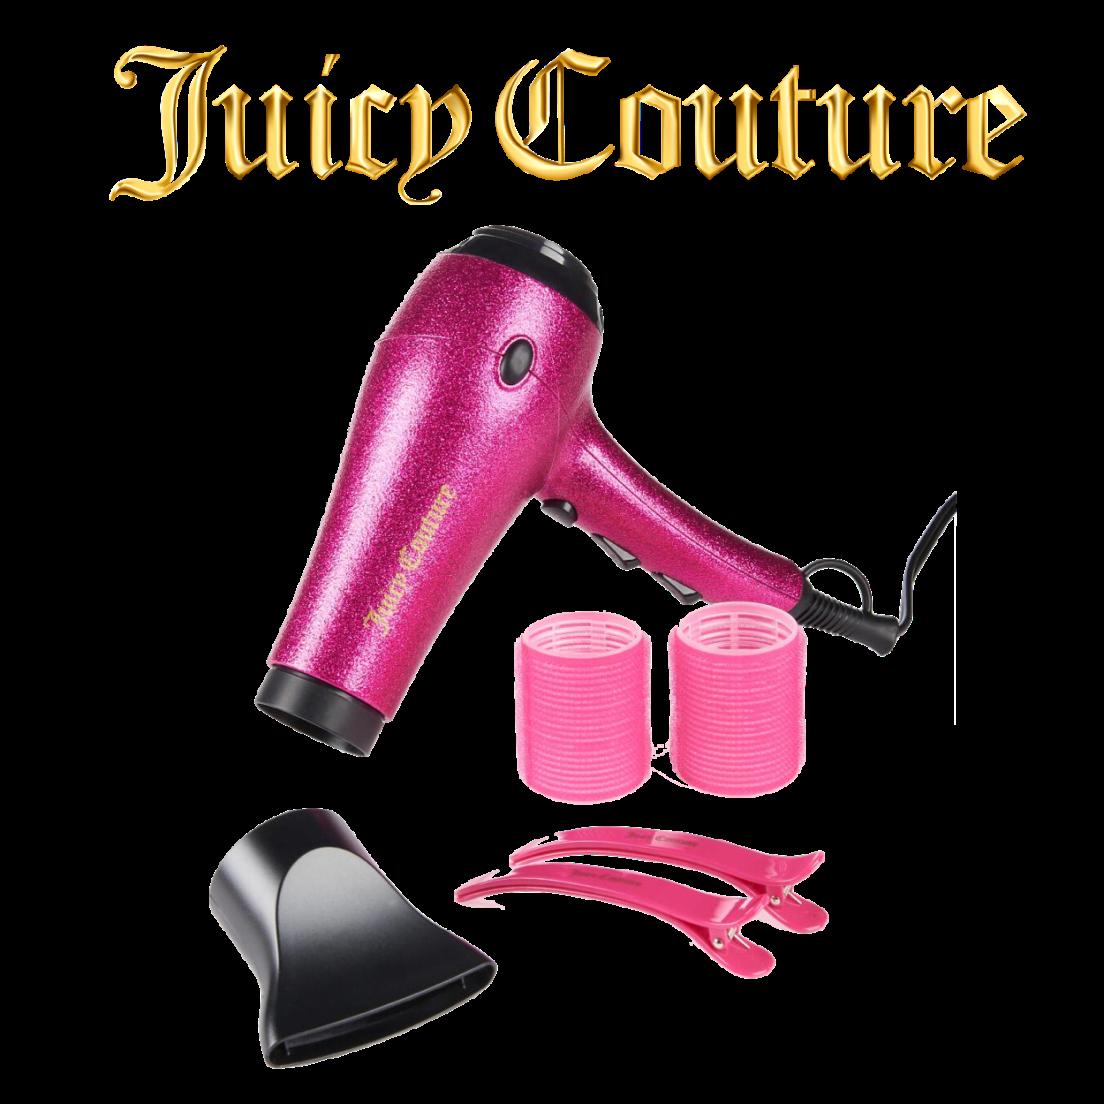 Juicy Couture 6 Piece Glitter Shine Blow Out Hair Dryer Set The Wet Brush Tourmaline Blowout Medium